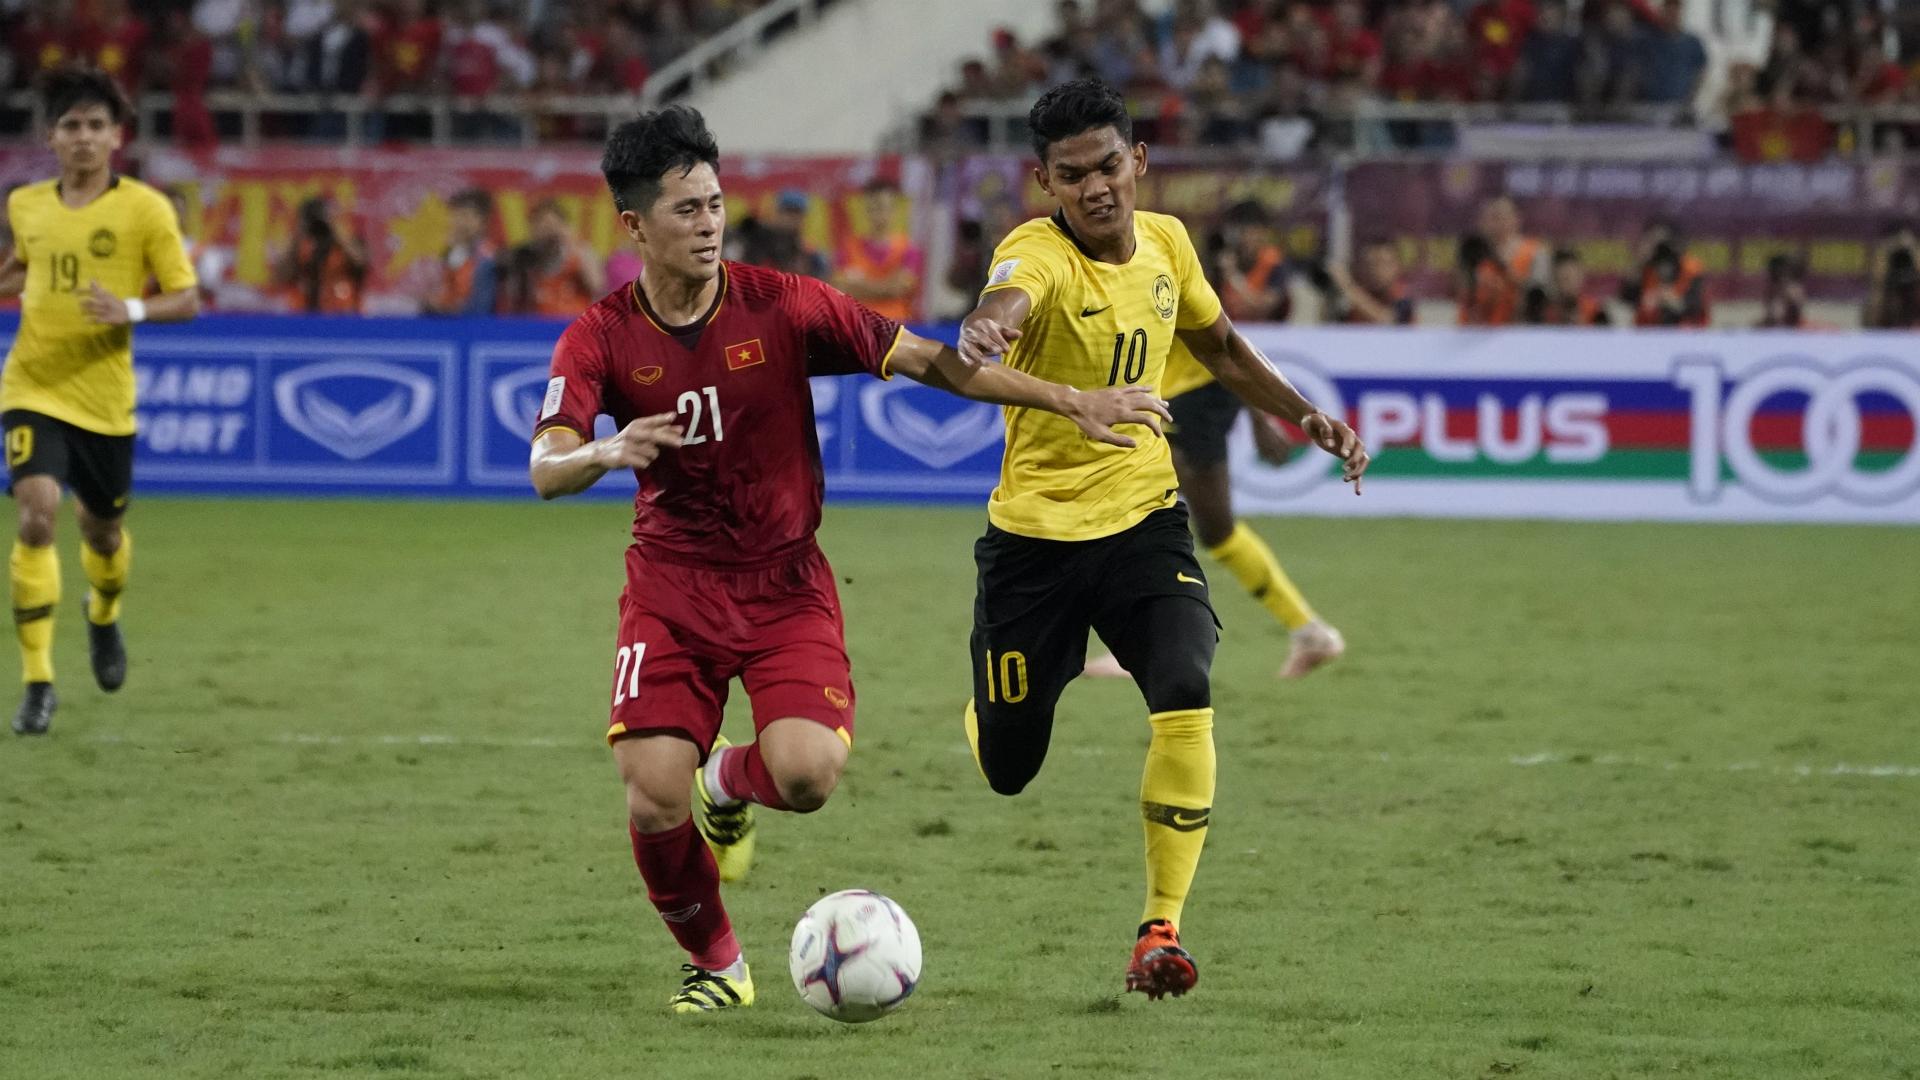 Shahrel Fikri, Malaysia, 2018 AFF Suzuki Cup